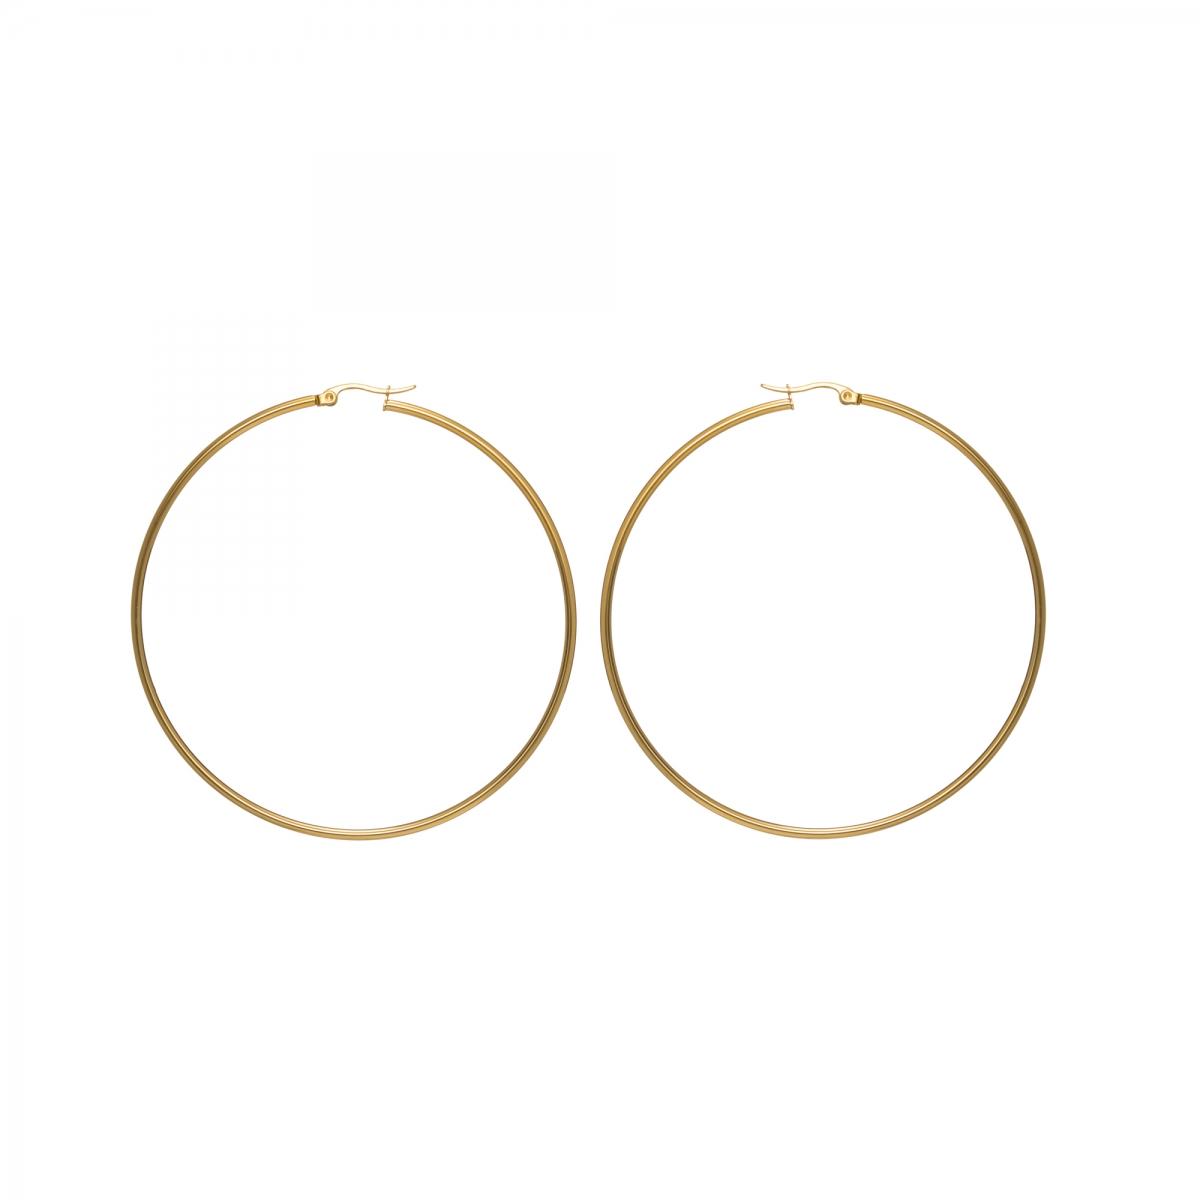 Náušnice Stainless Steel Mini Hoop Earring Gold